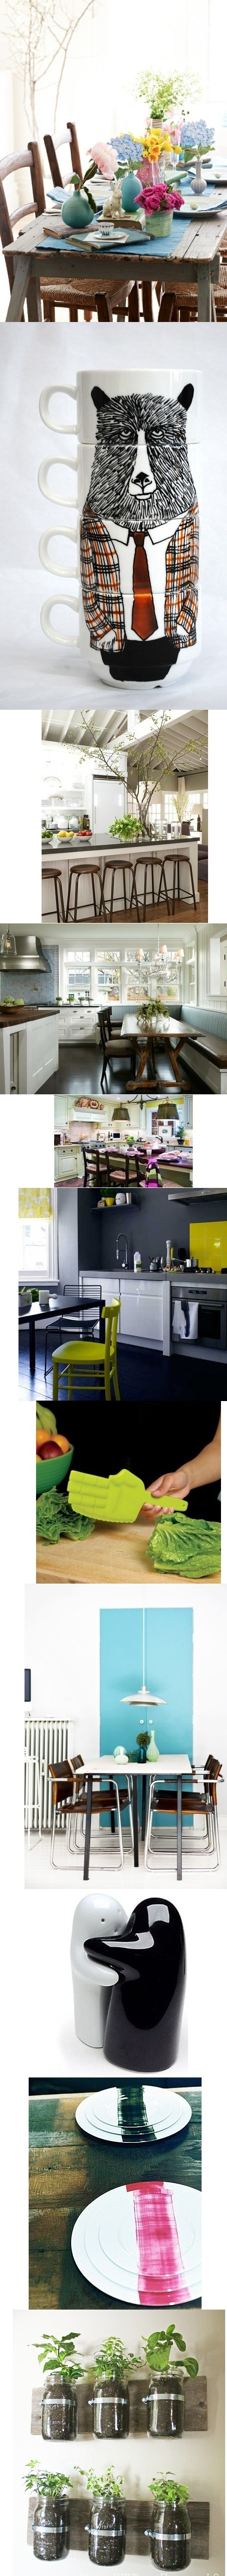 kitchen kitchen kitchen